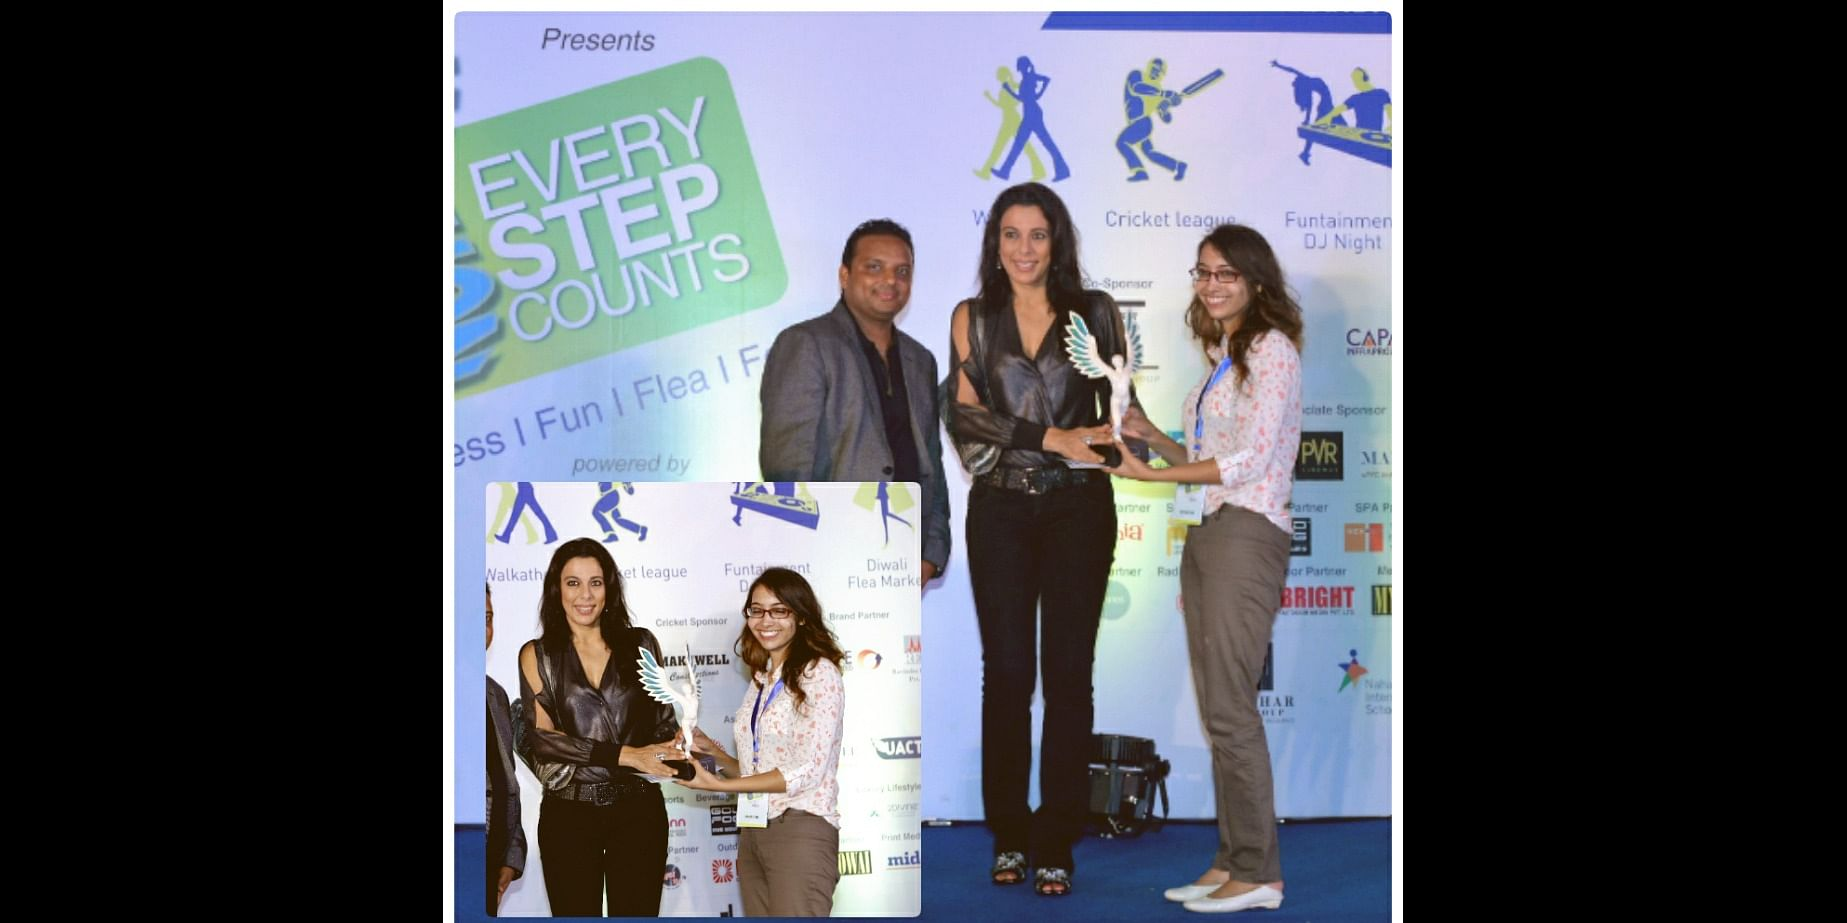 Rupal Jain, the founder & owner of Kreativekeeda.com getting best stuff award at an event.